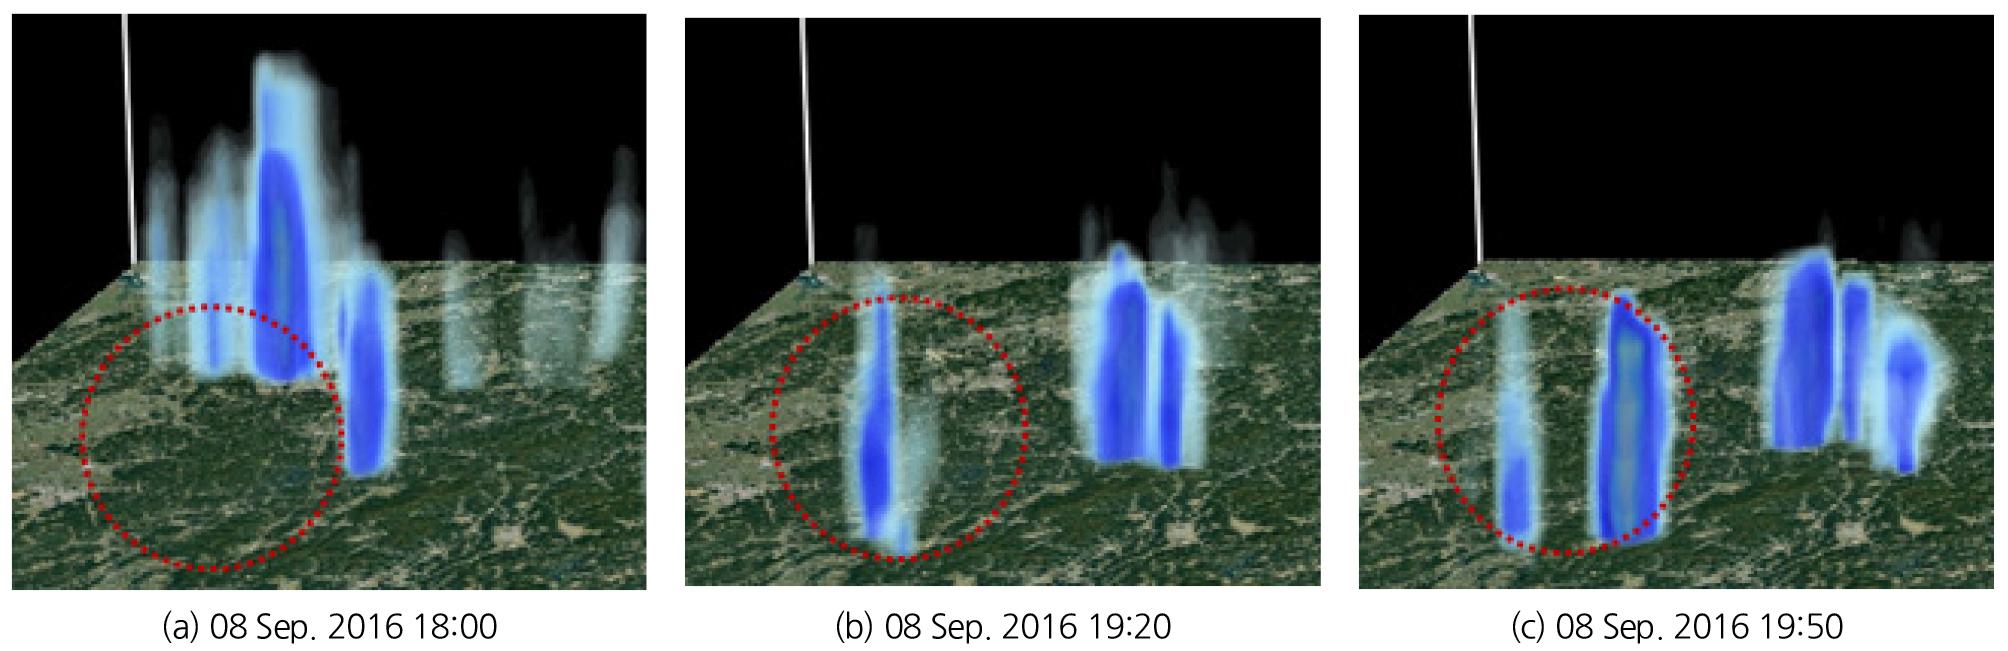 http://static.apub.kr/journalsite/sites/kwra/2020-053-04/N0200530408/images/kwra_53_04_08_F7.jpg